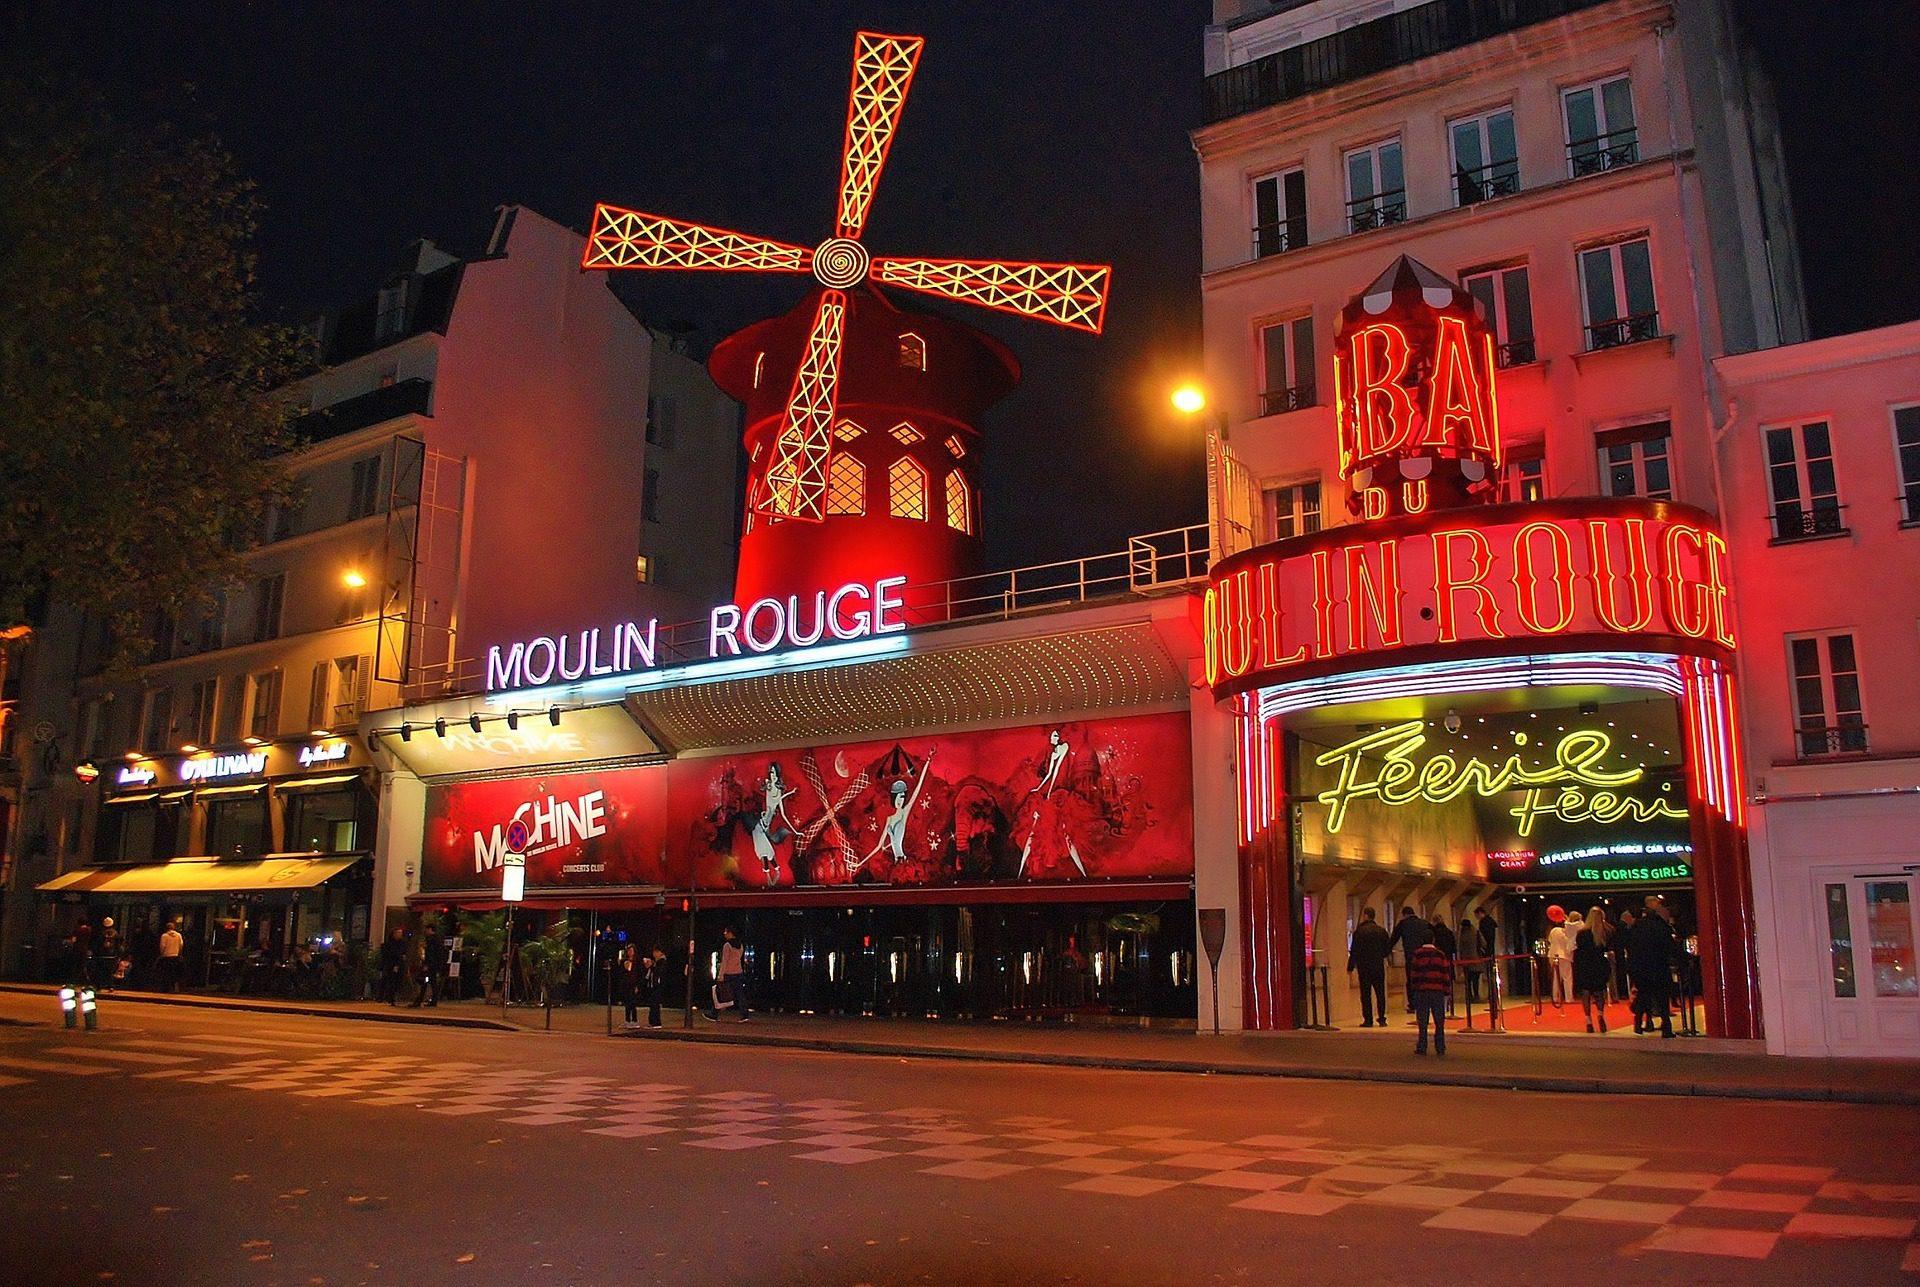 http://www.moulinrouge.fr/?lang=en